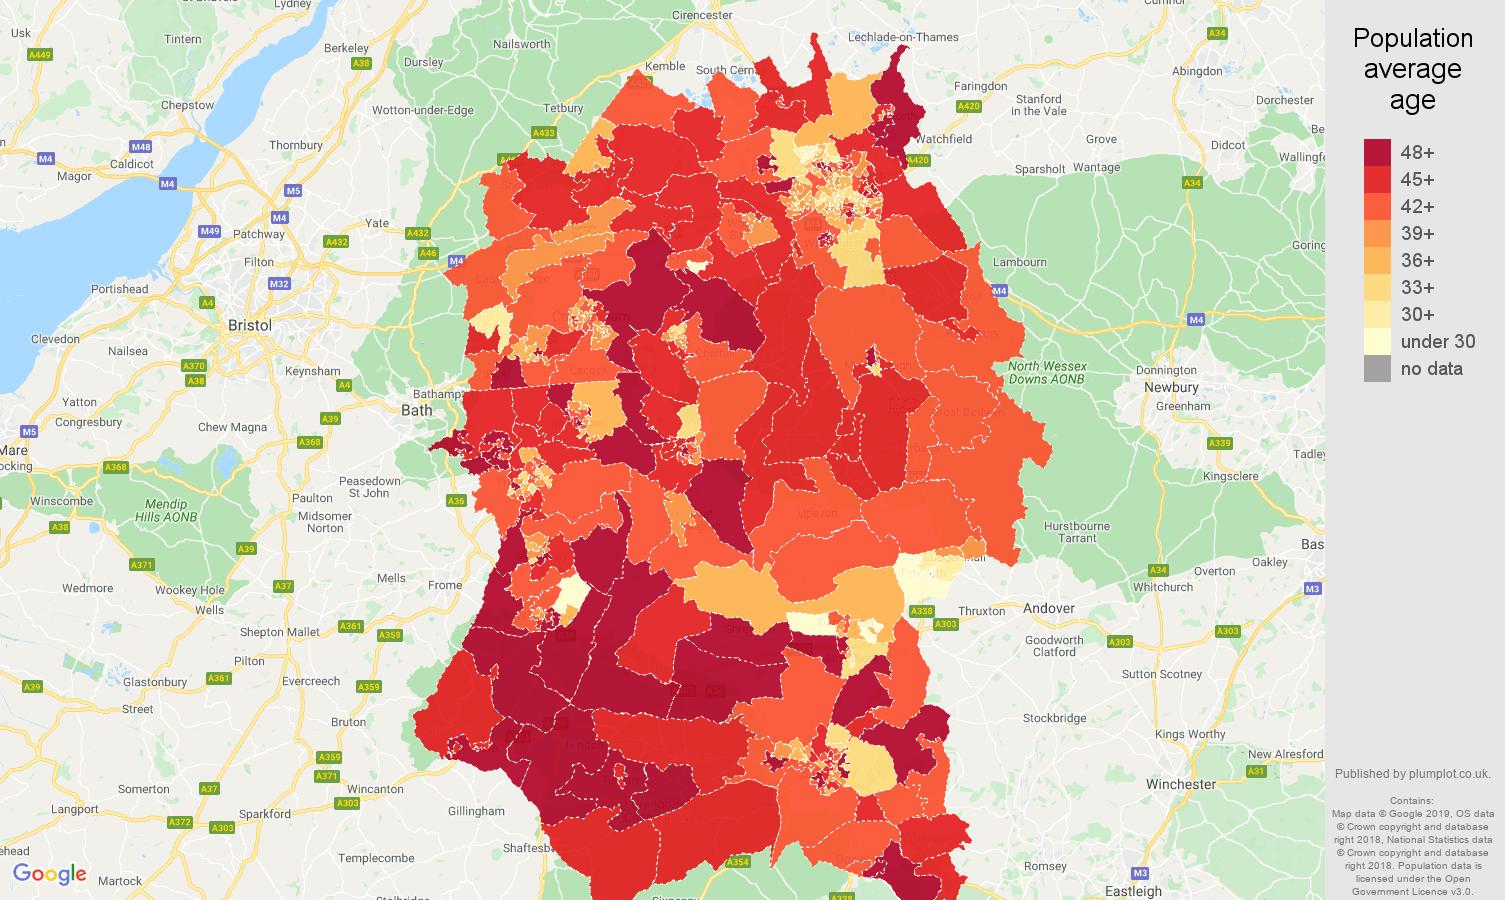 Wiltshire population average age map